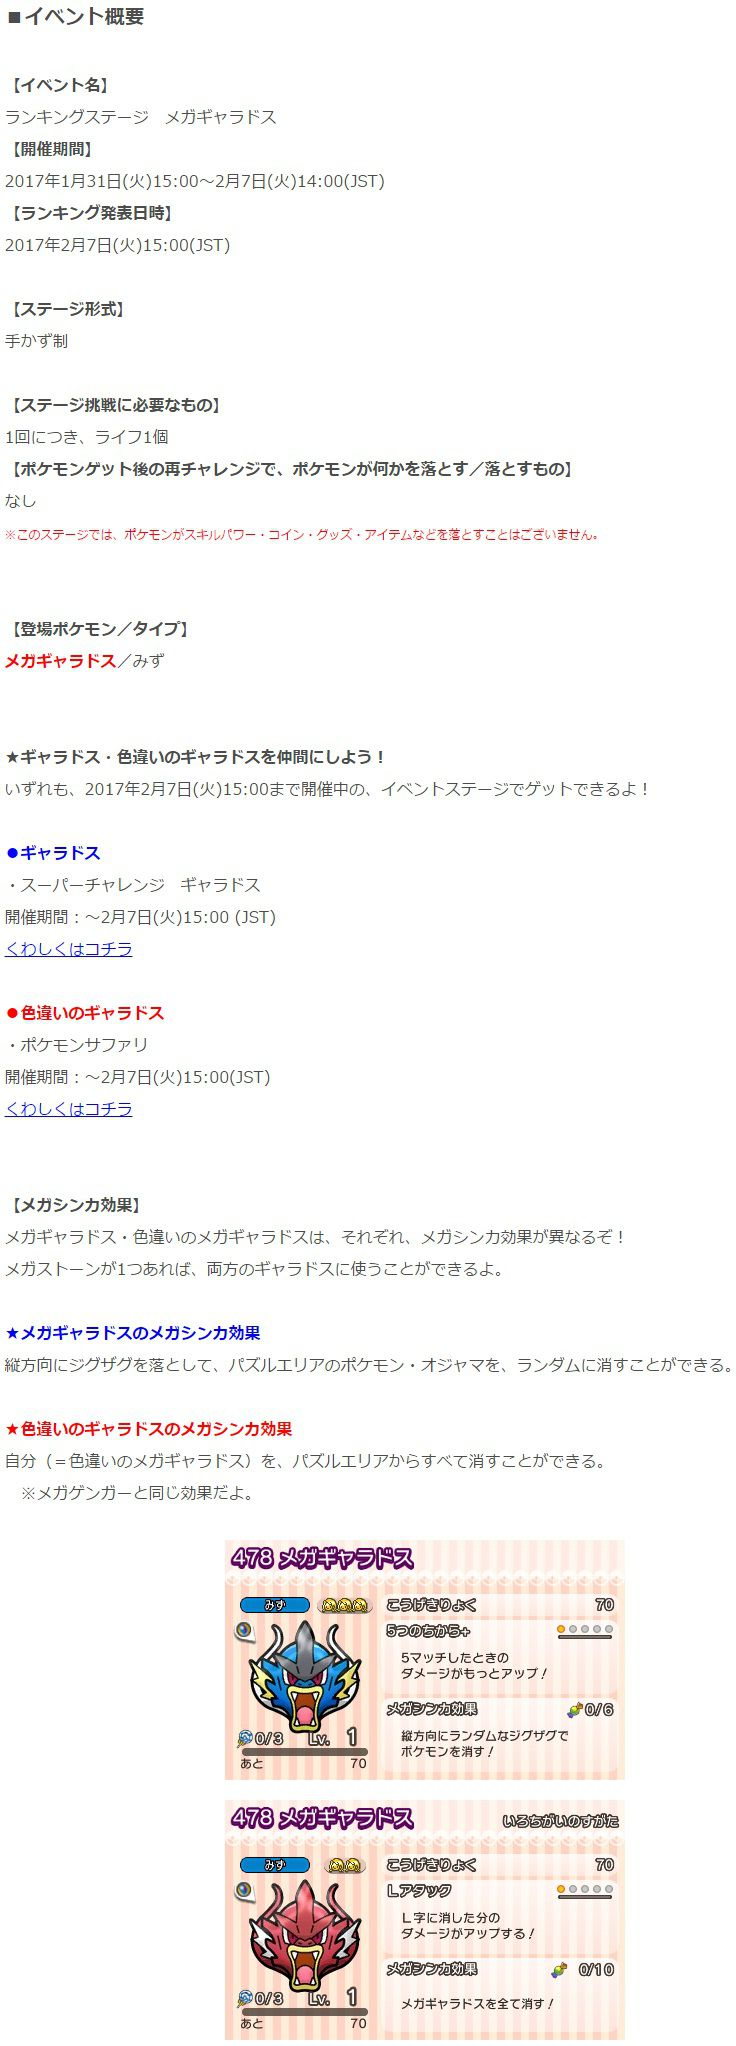 image_8048.jpg